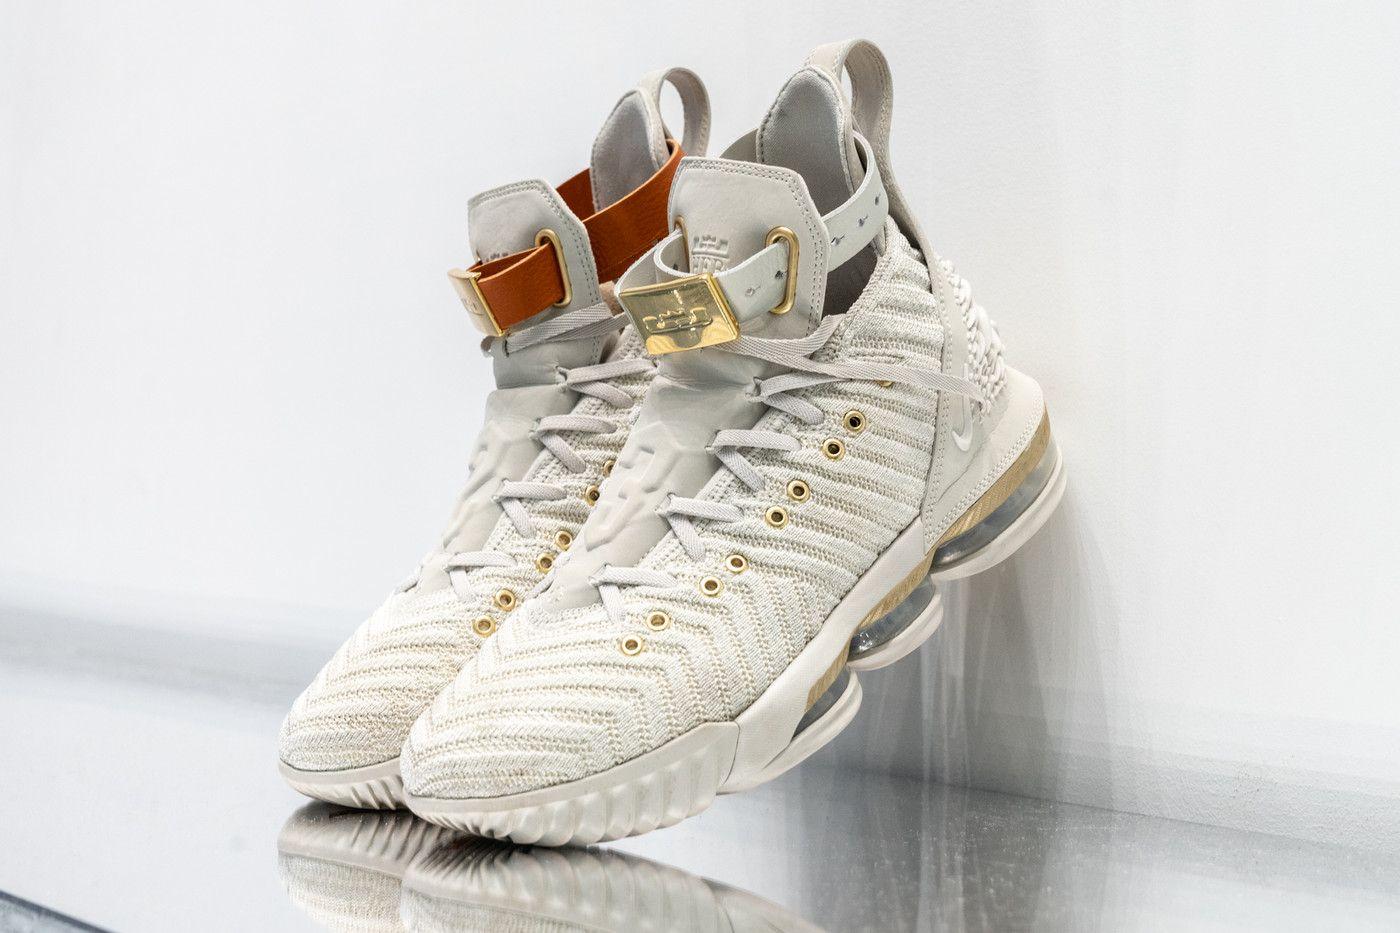 Nike basketball shoes, Nike elite socks